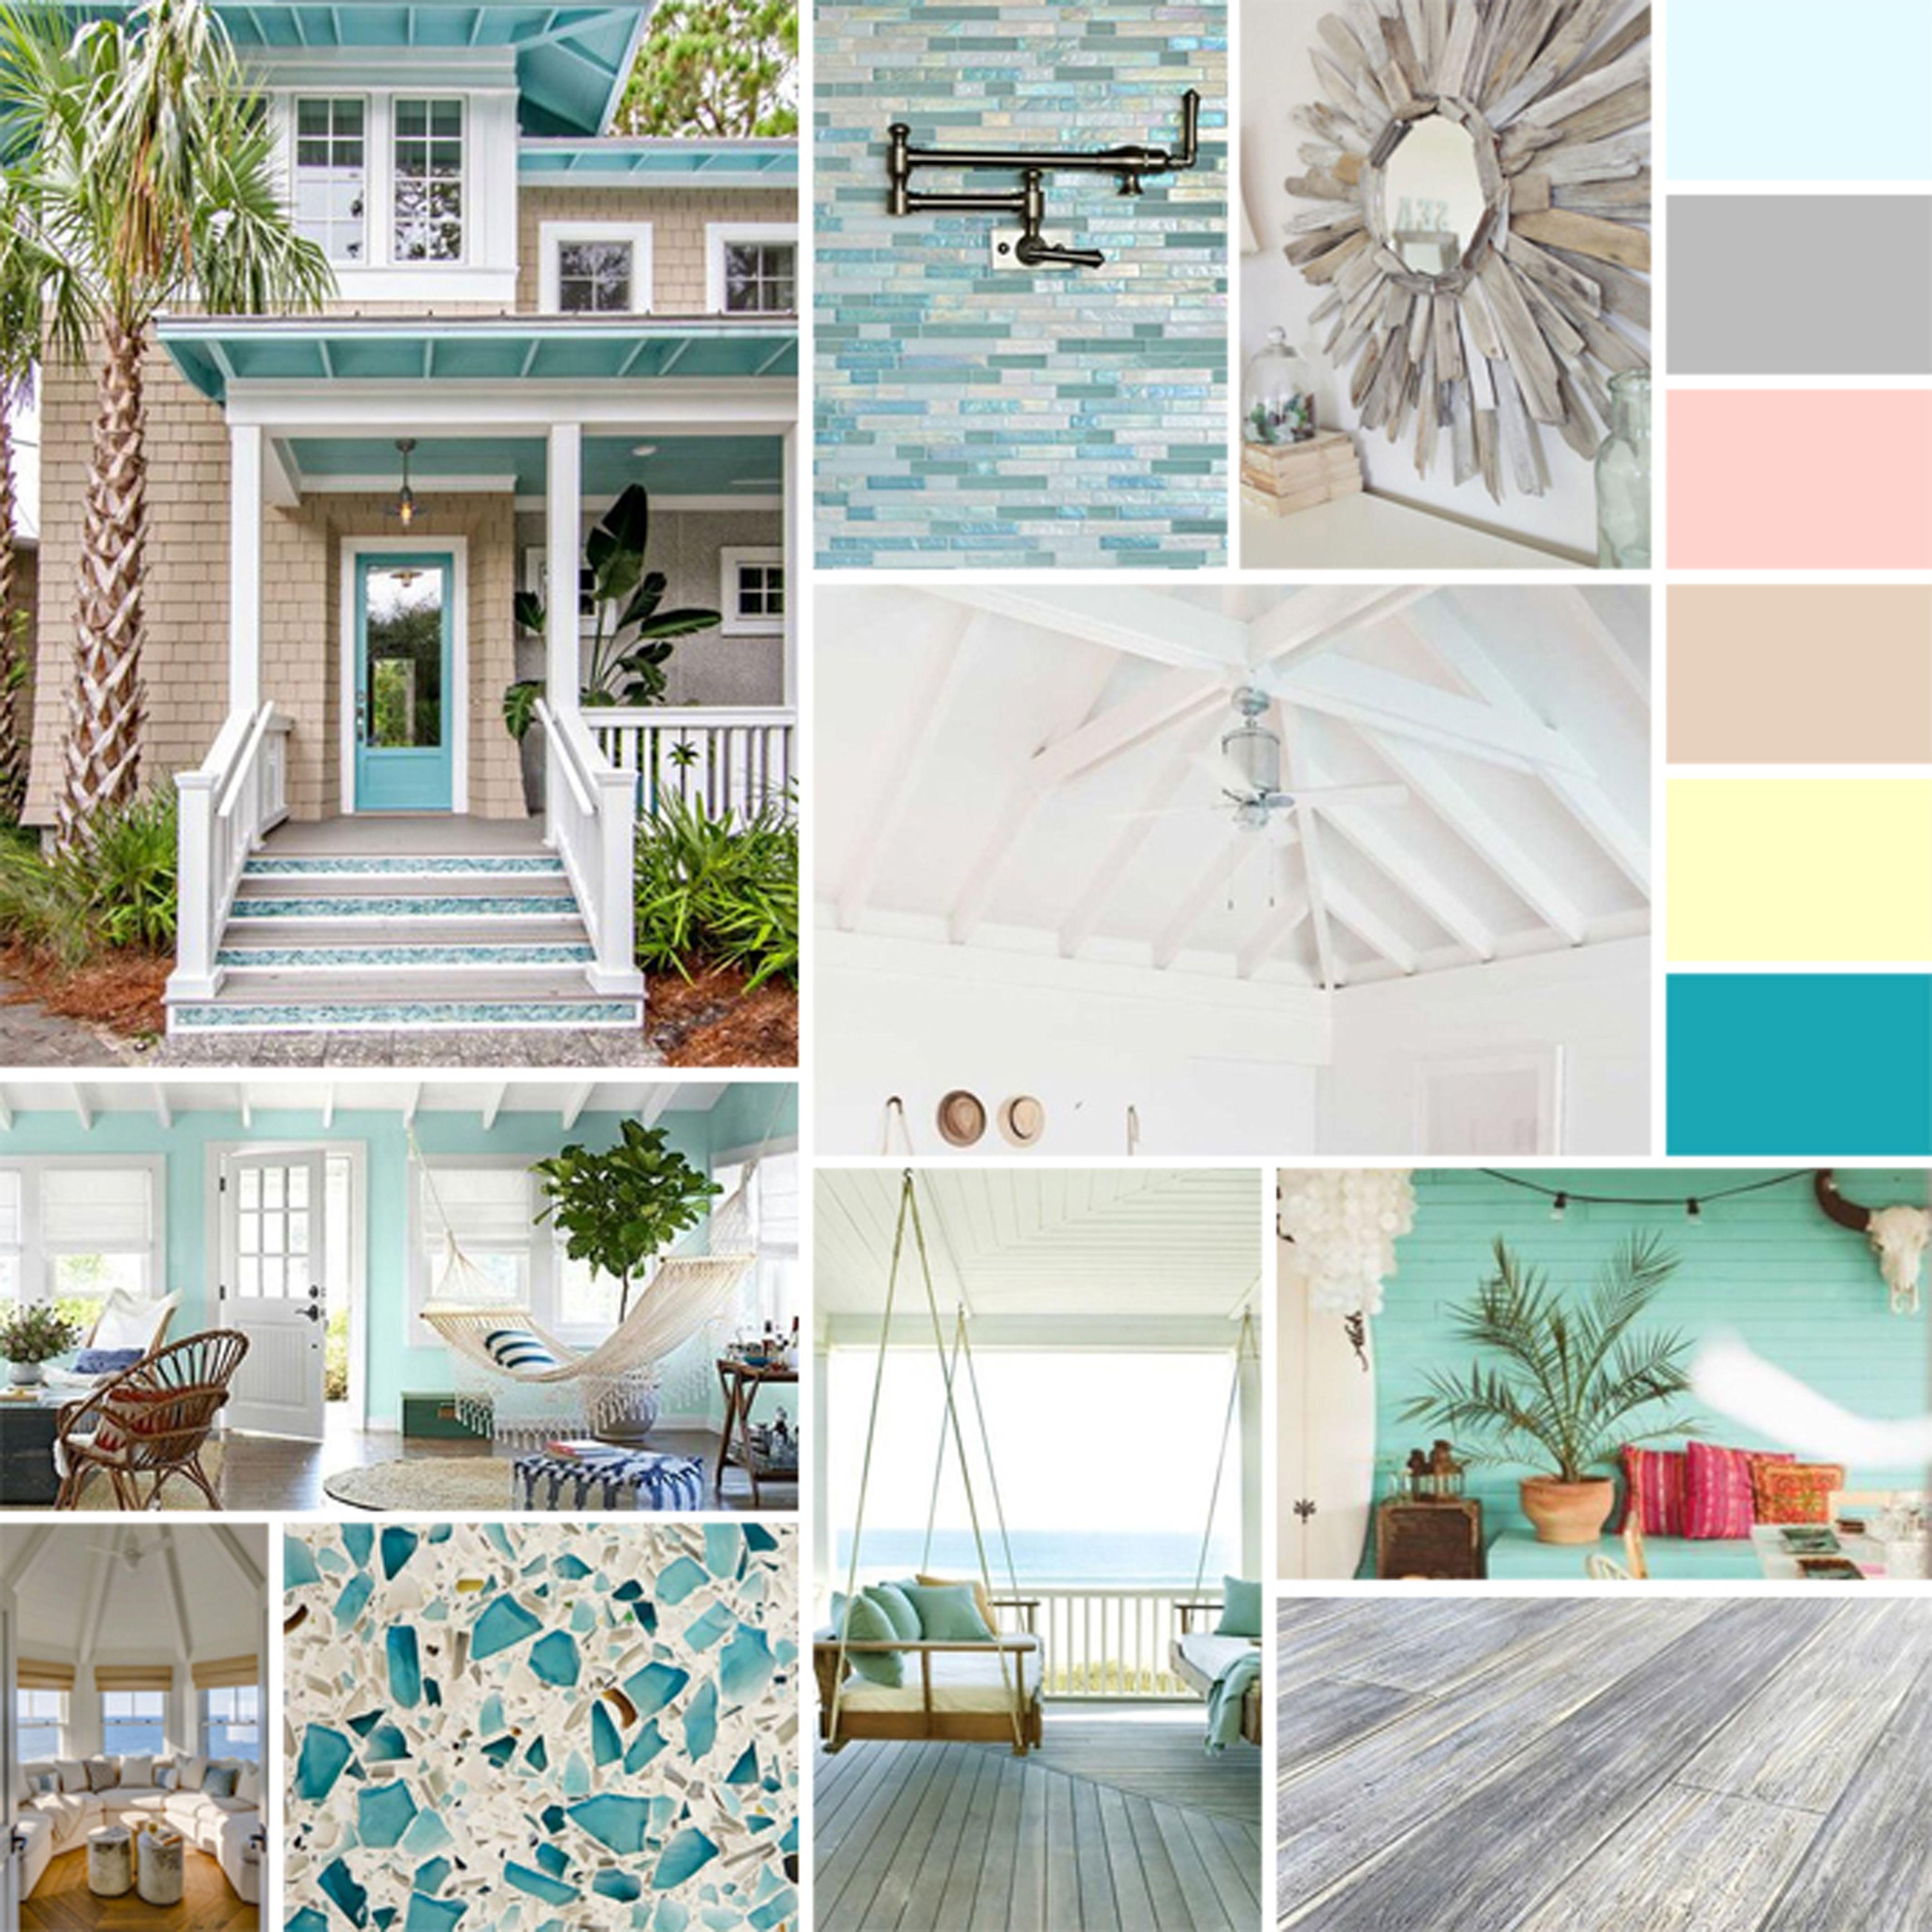 7 Swoon Worthy Beach Homes + Decor Inspo